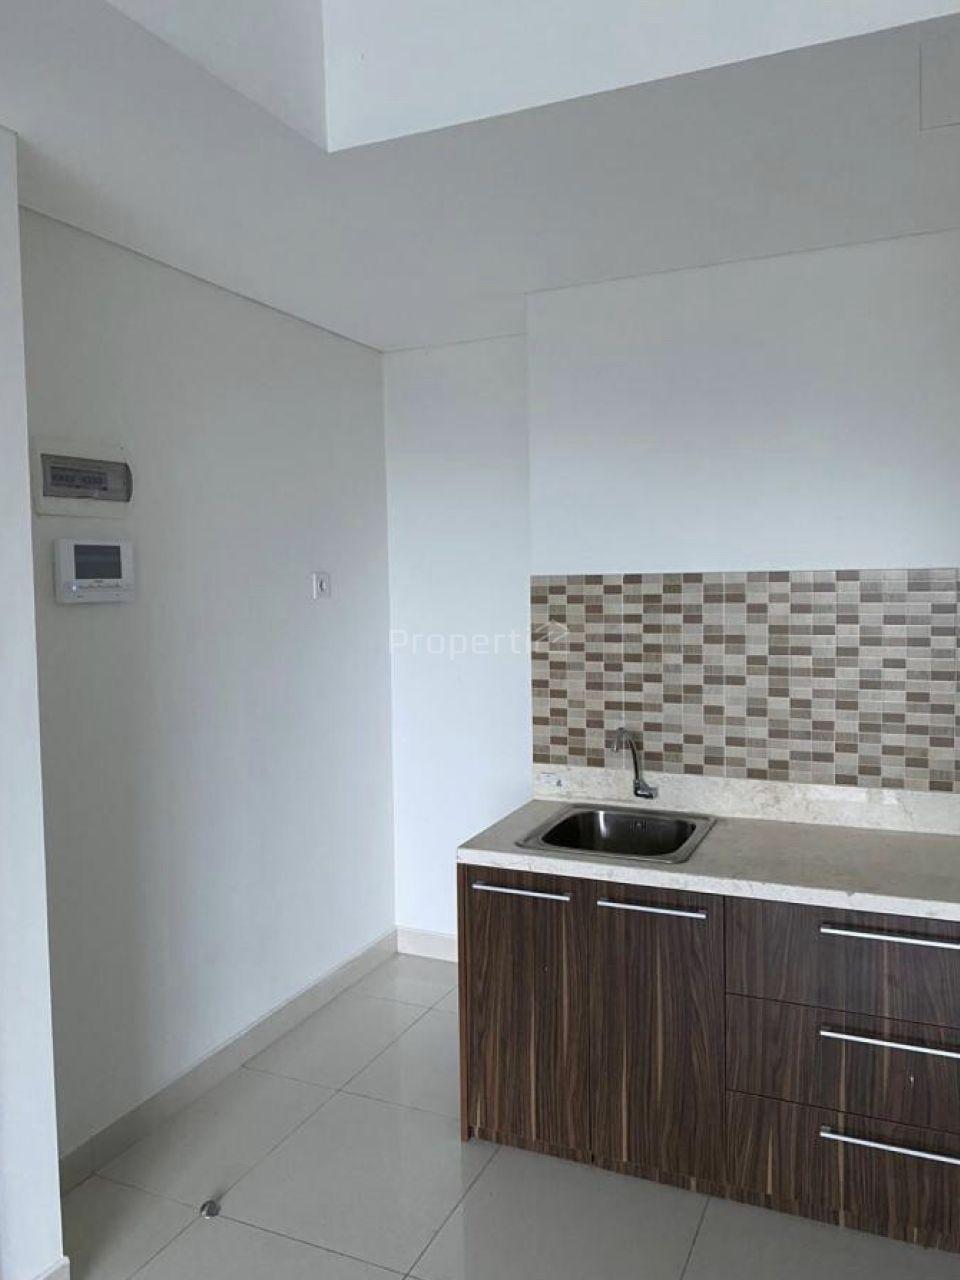 1BR Apartment Unit at The Aspen Admiralty Apartment, Jakarta Selatan